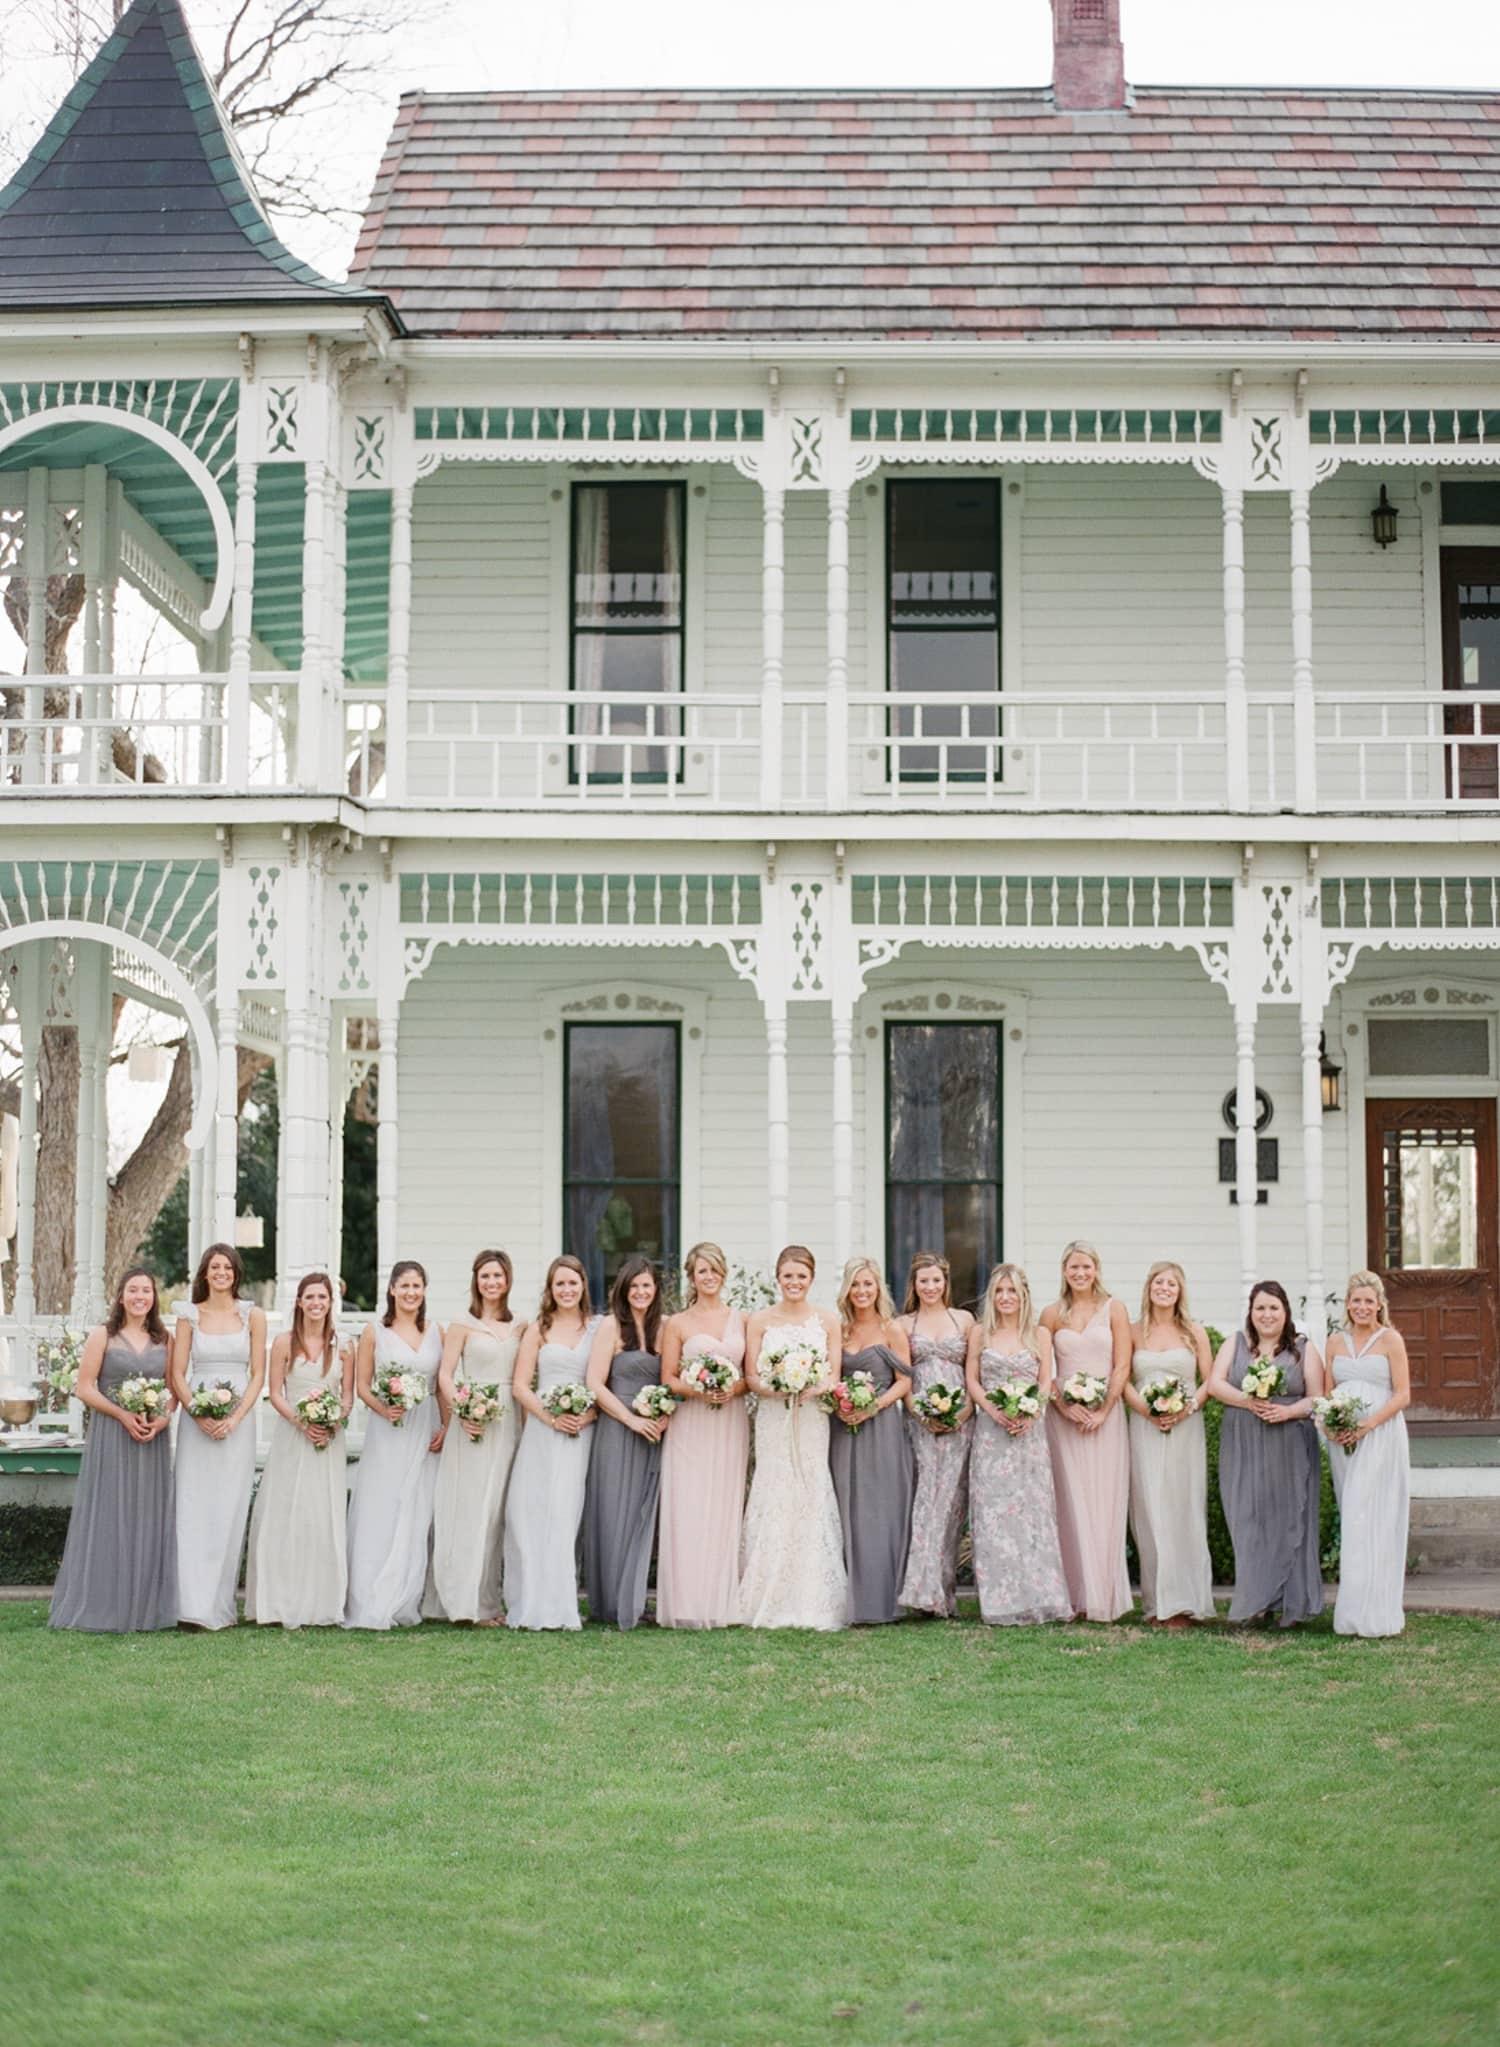 barr-mansion-wedding-5.jpg